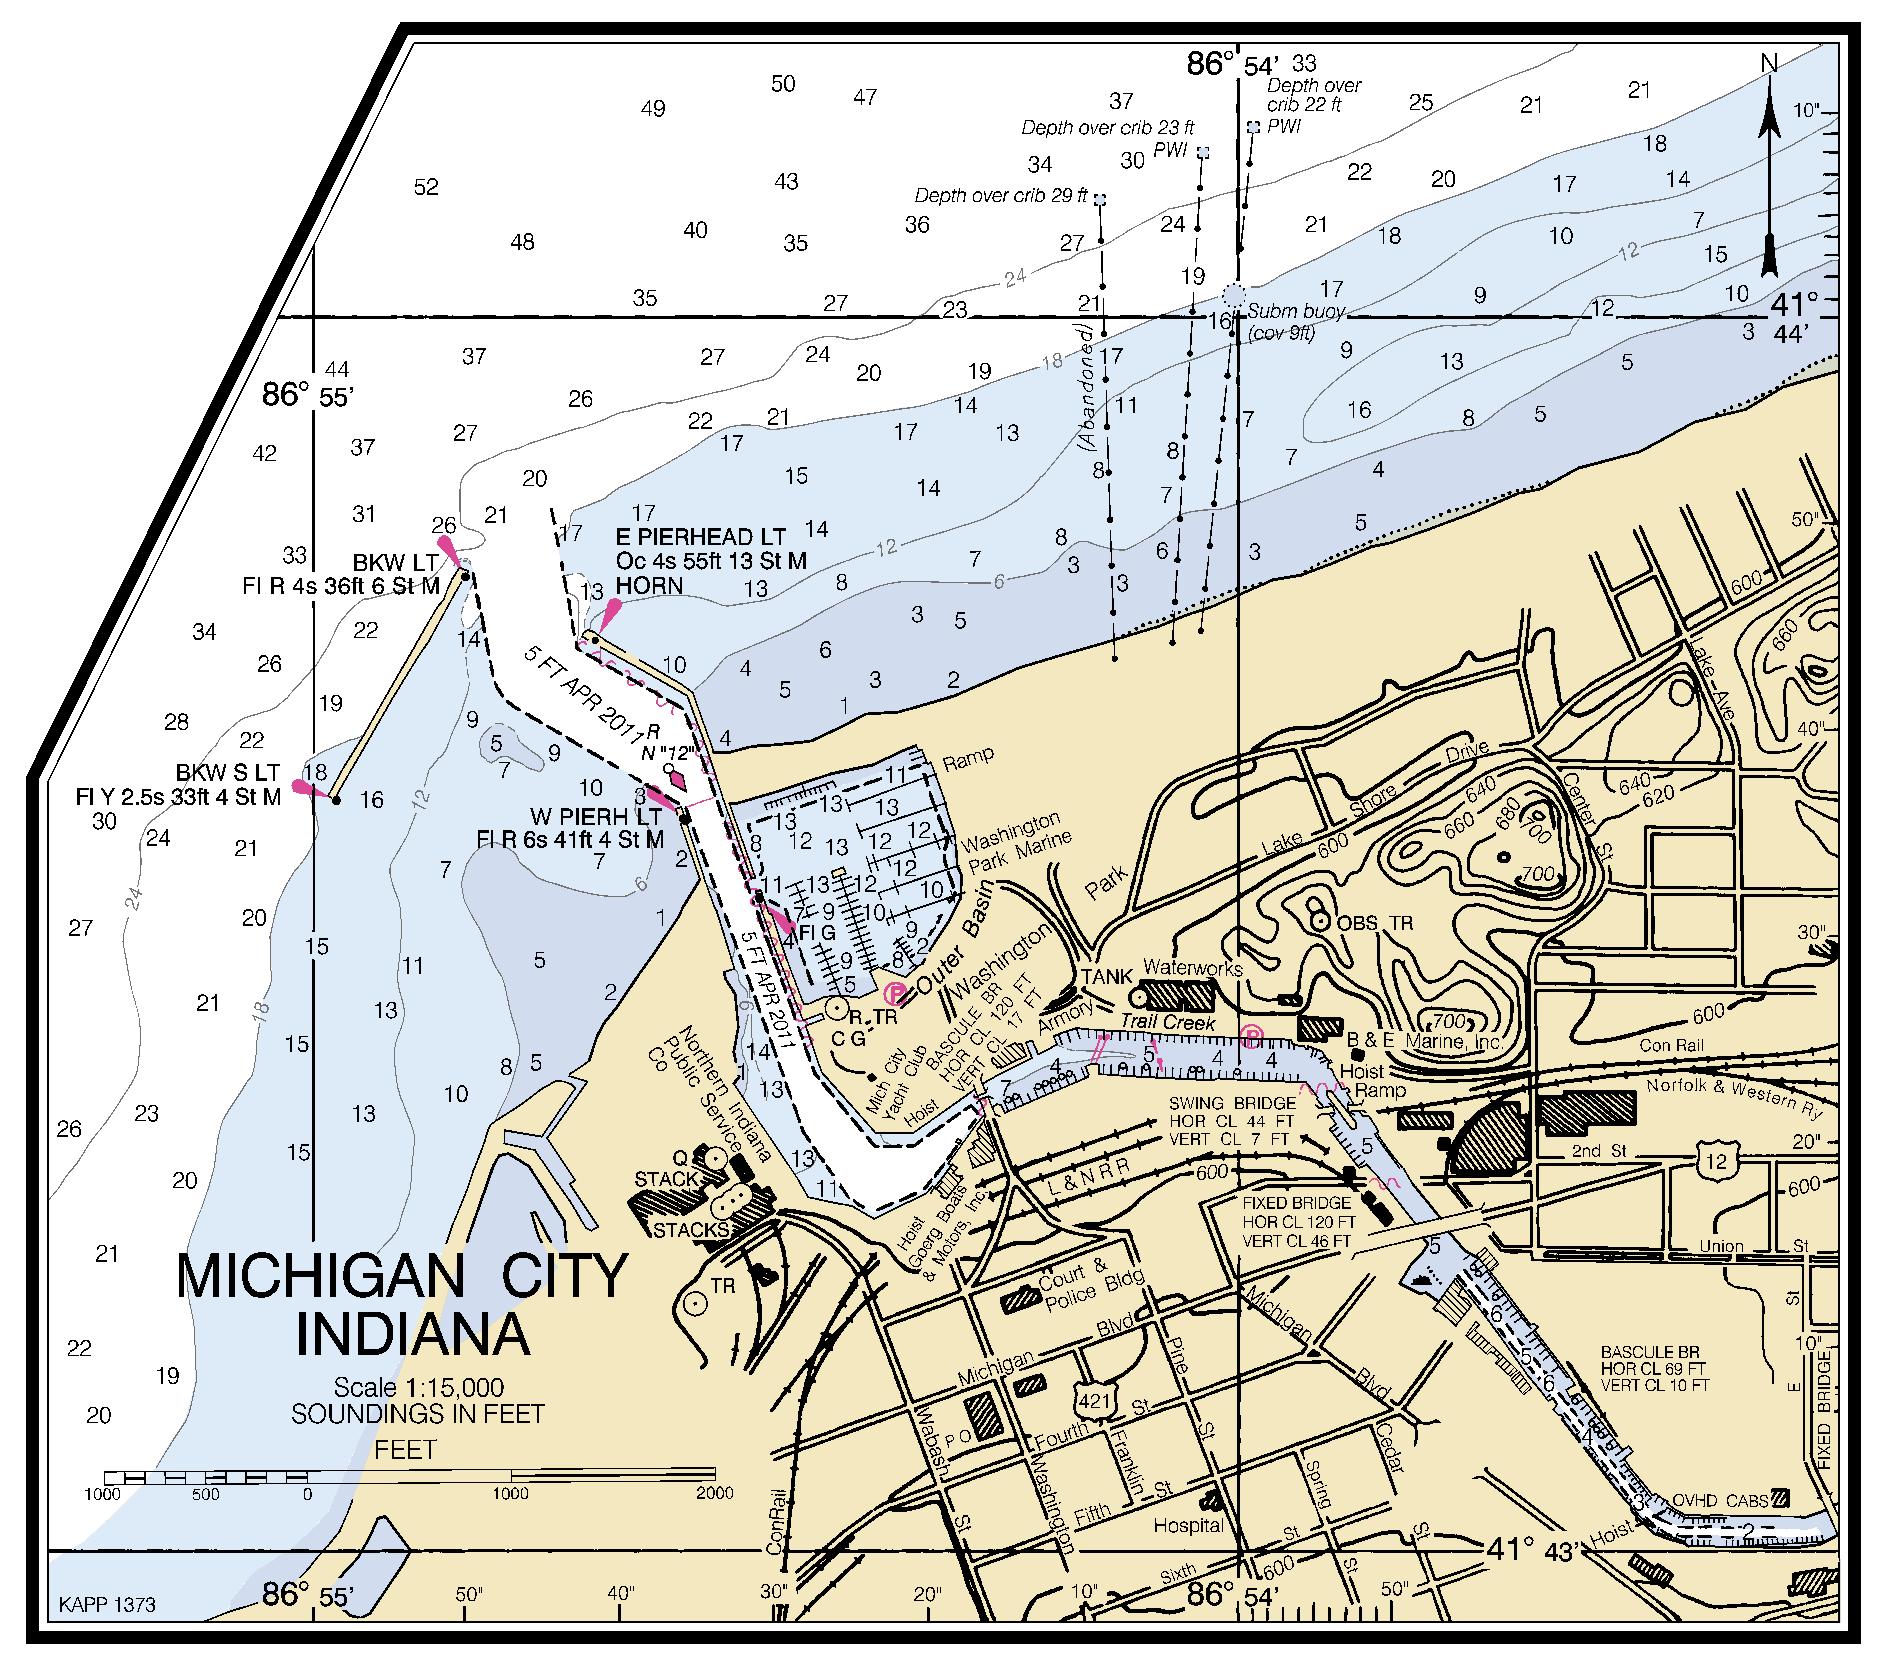 MICHIGAN CITY INDIANA Nautical Chart   Charts  Maps